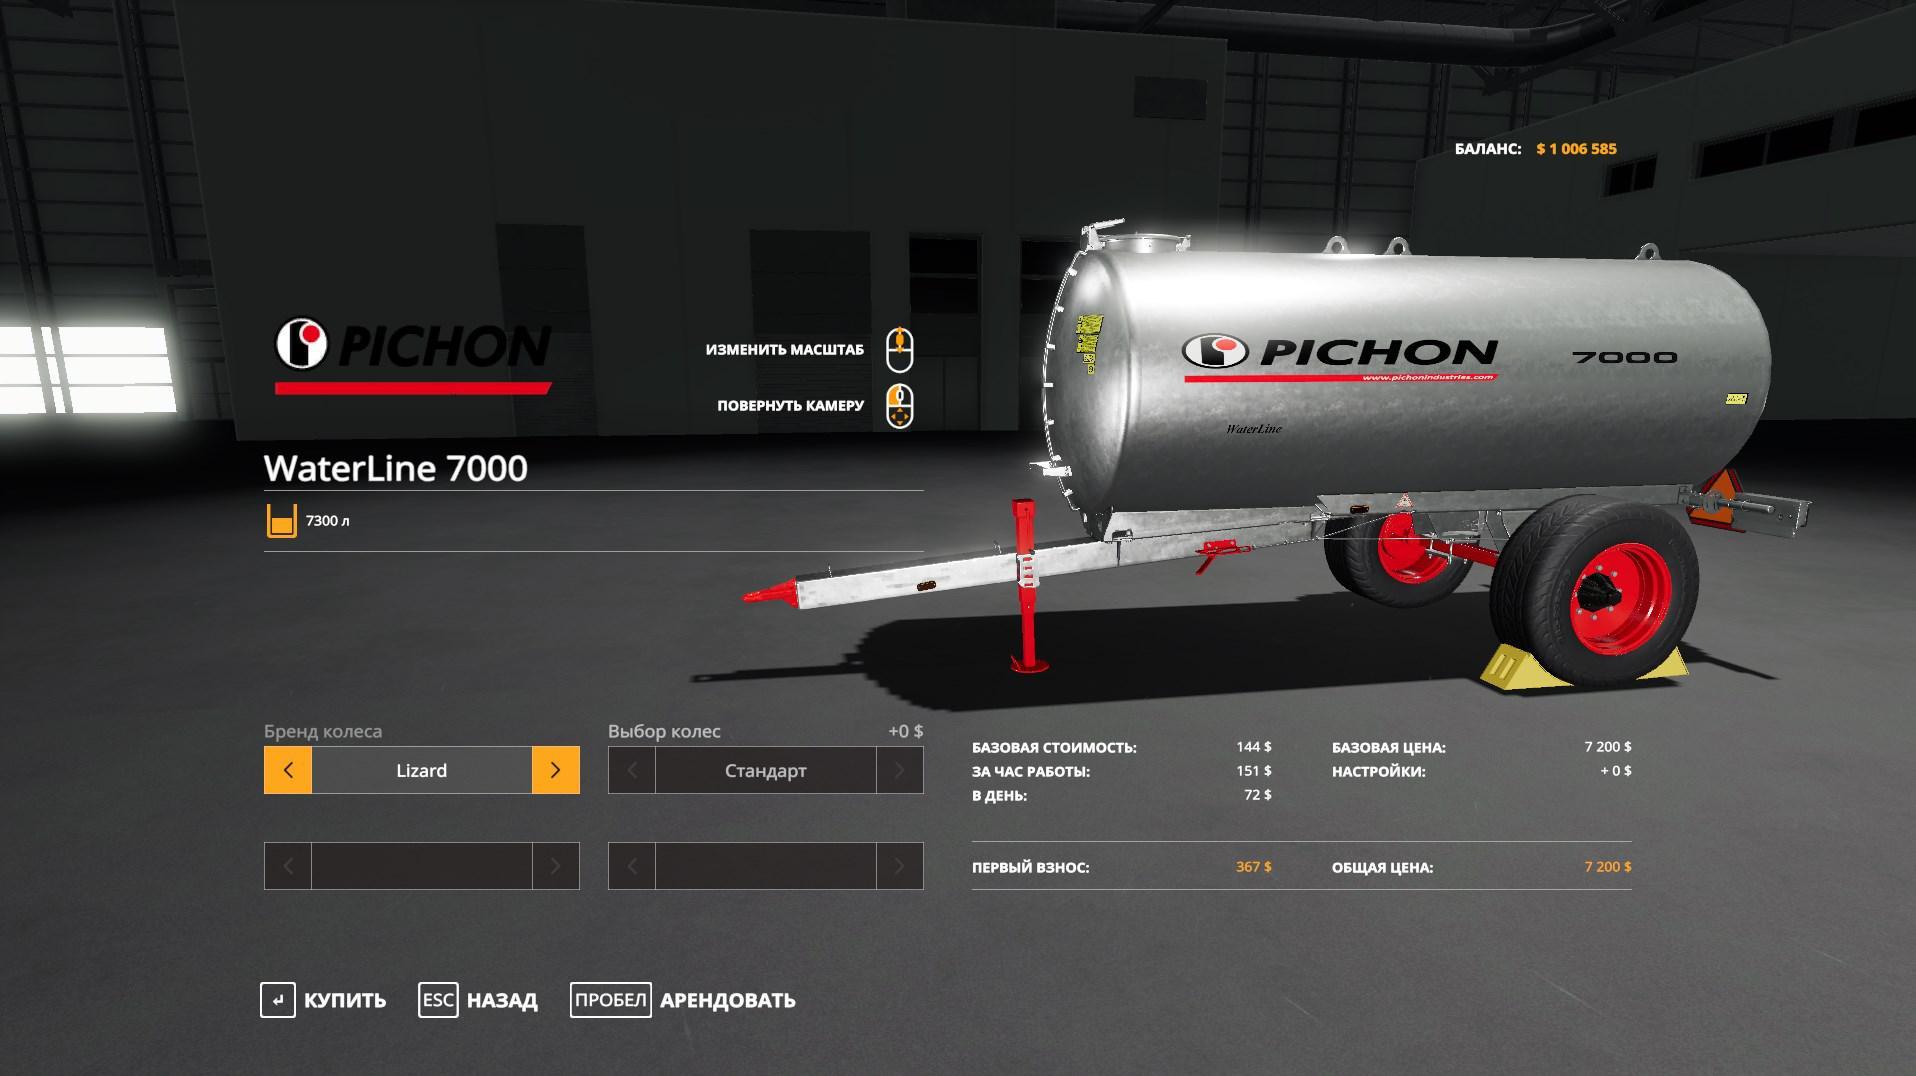 Pichon WaterLine 7000 V1